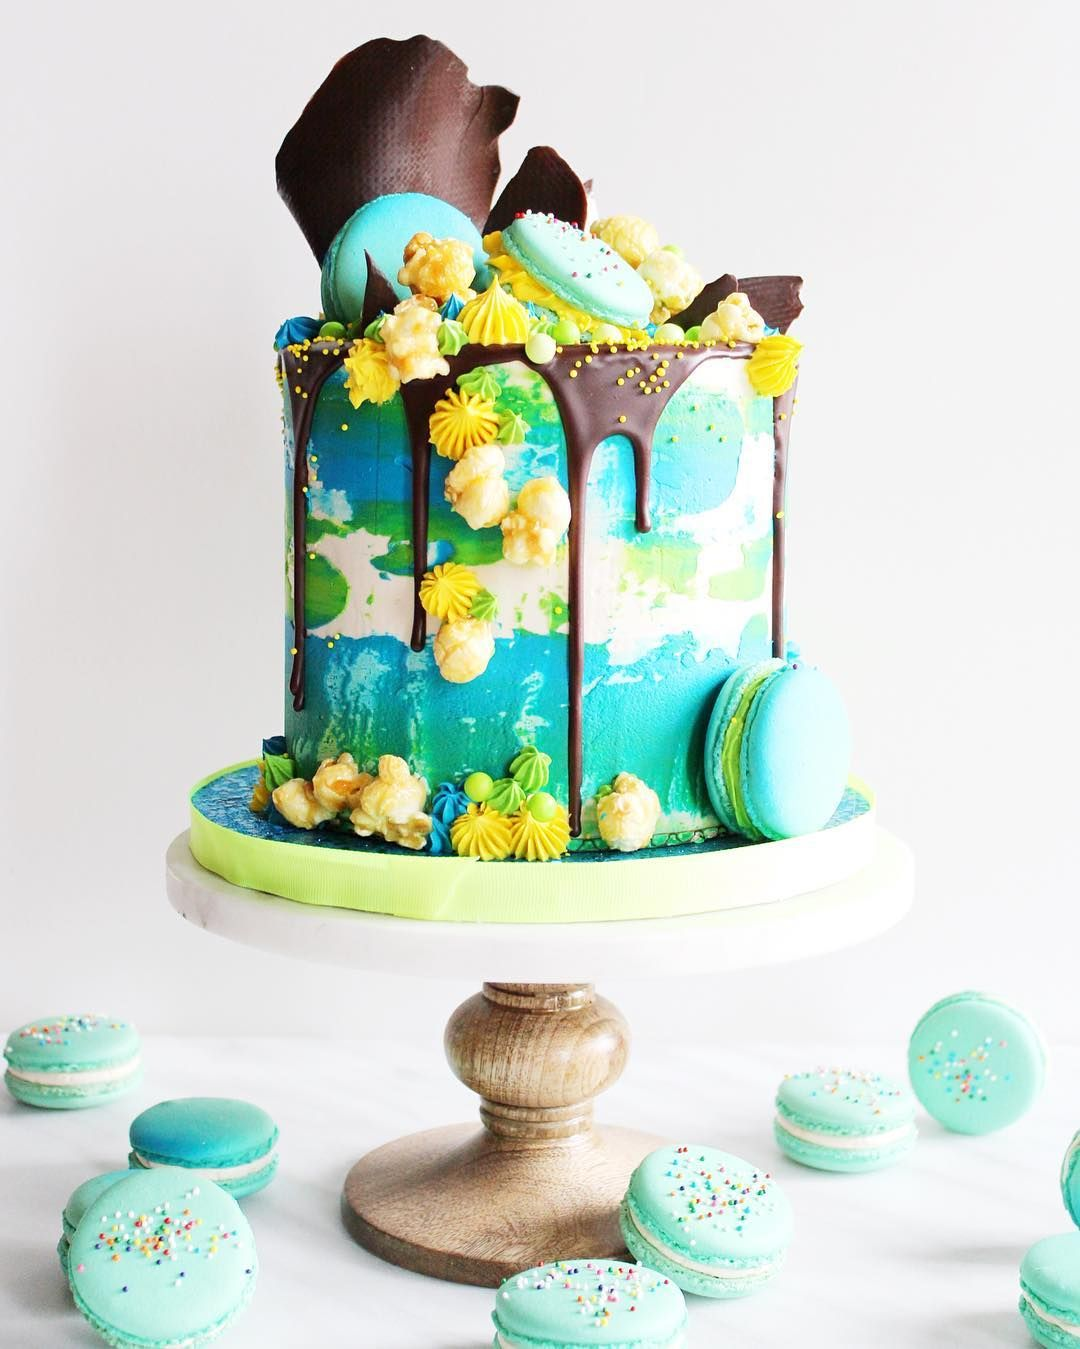 Fesselnd Jonathan Caleb   Bluw Grten Yellow Layer Cake Chocolate Drip Macarons